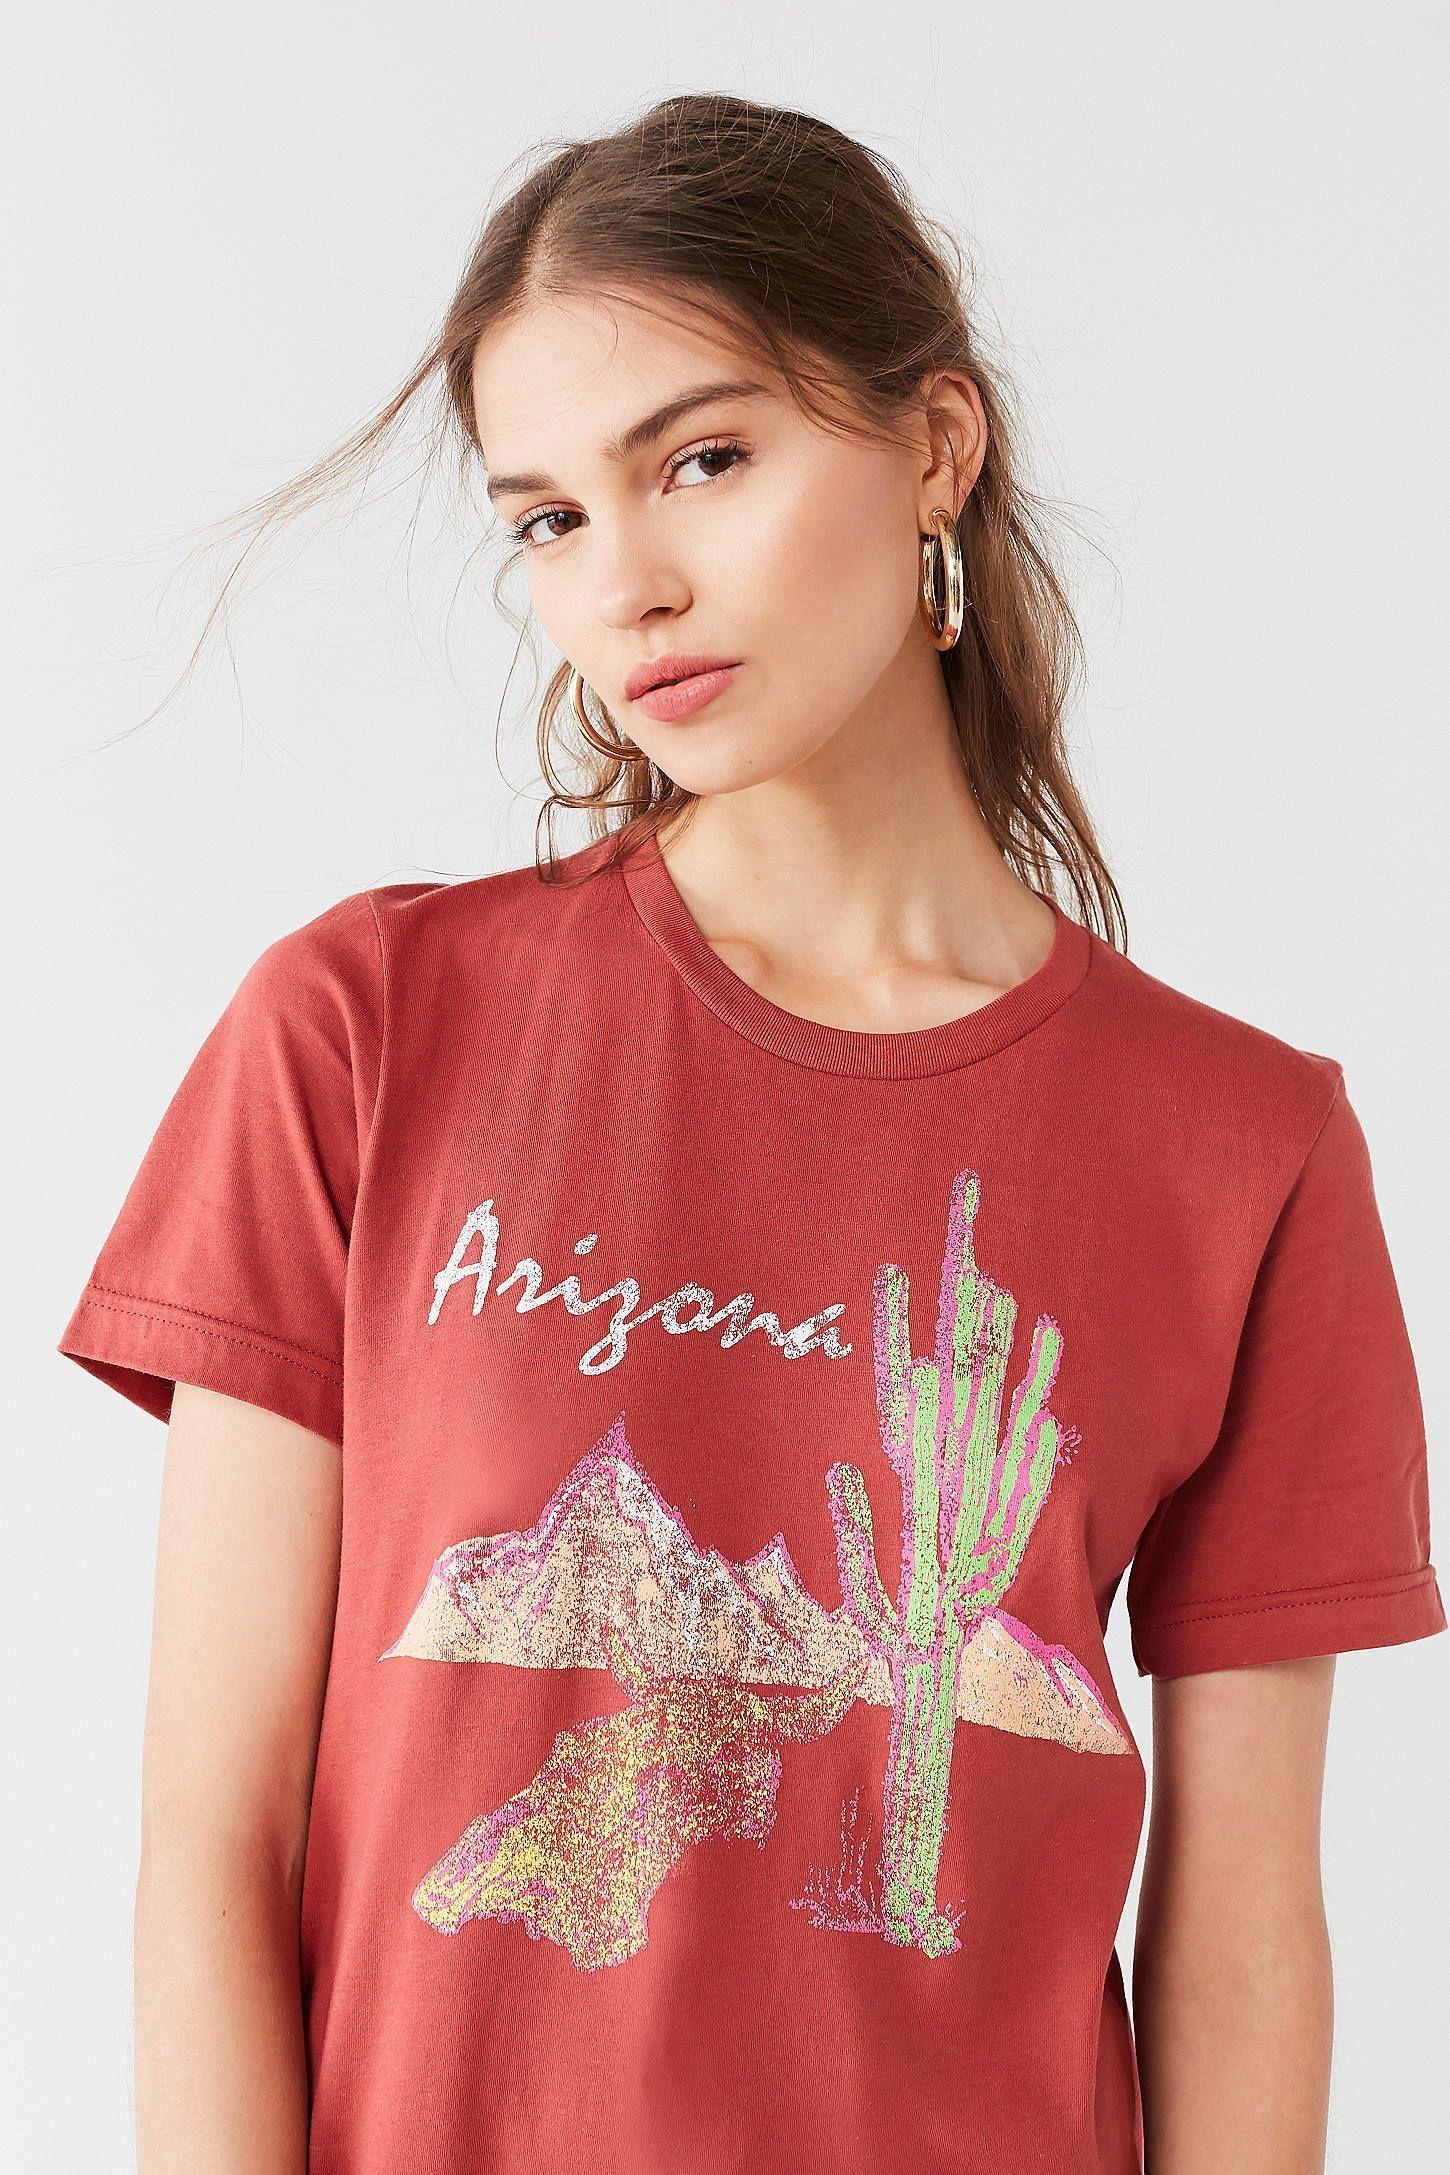 Arizona Cactus Tee #arizonacactus Slide View: 4: Arizona Cactus Tee #arizonacactus Arizona Cactus Tee #arizonacactus Slide View: 4: Arizona Cactus Tee #arizonacactus Arizona Cactus Tee #arizonacactus Slide View: 4: Arizona Cactus Tee #arizonacactus Arizona Cactus Tee #arizonacactus Slide View: 4: Arizona Cactus Tee #arizonacactus